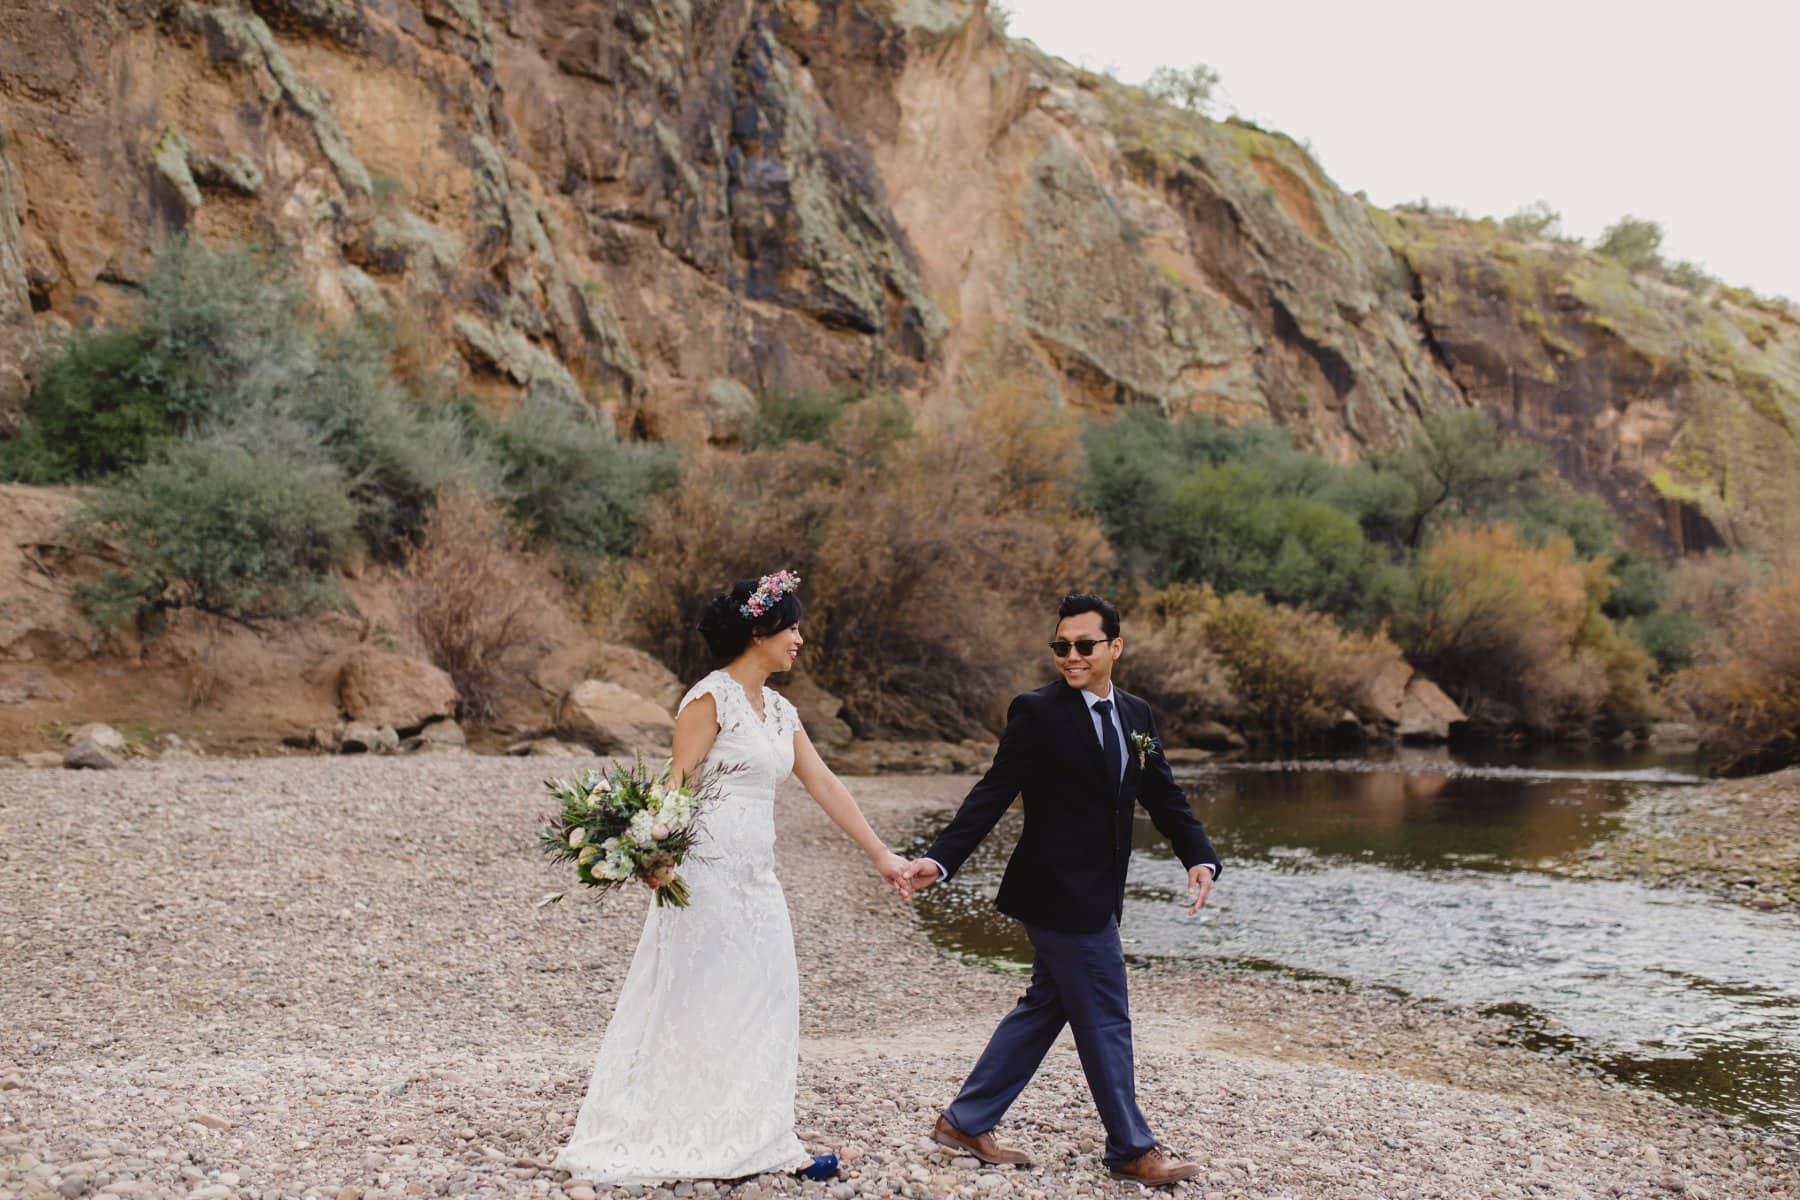 beautiful outdoor wedding locations in Arizona